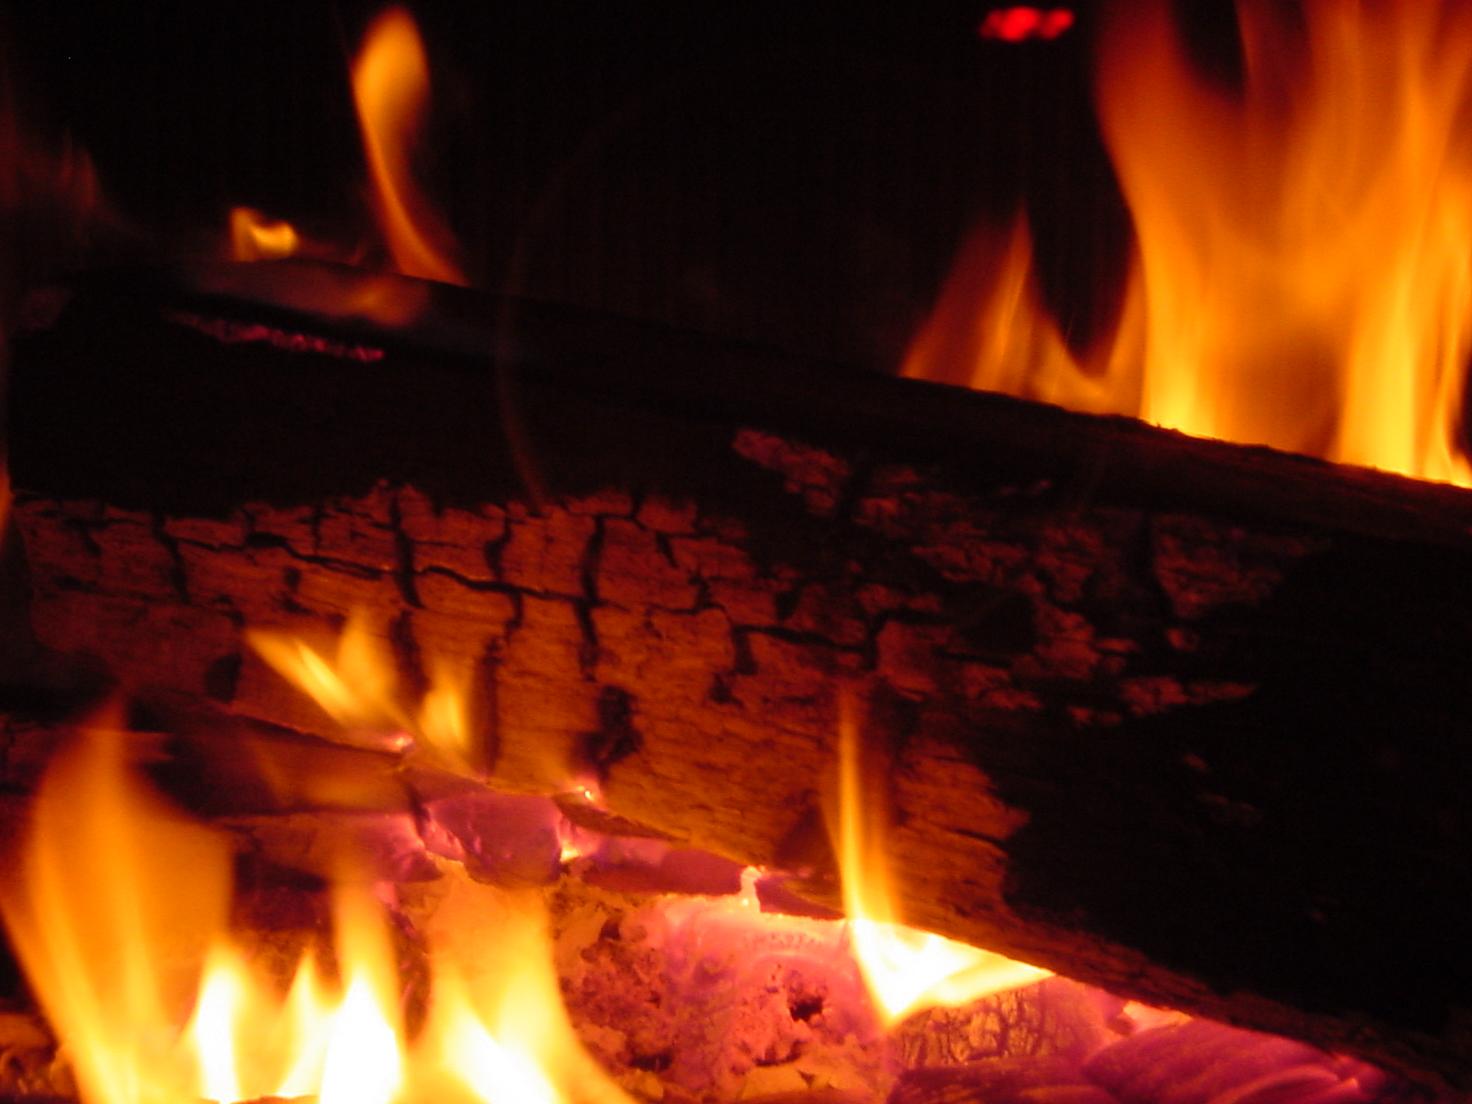 insektokutor fire campfire flames fireplace hot orange